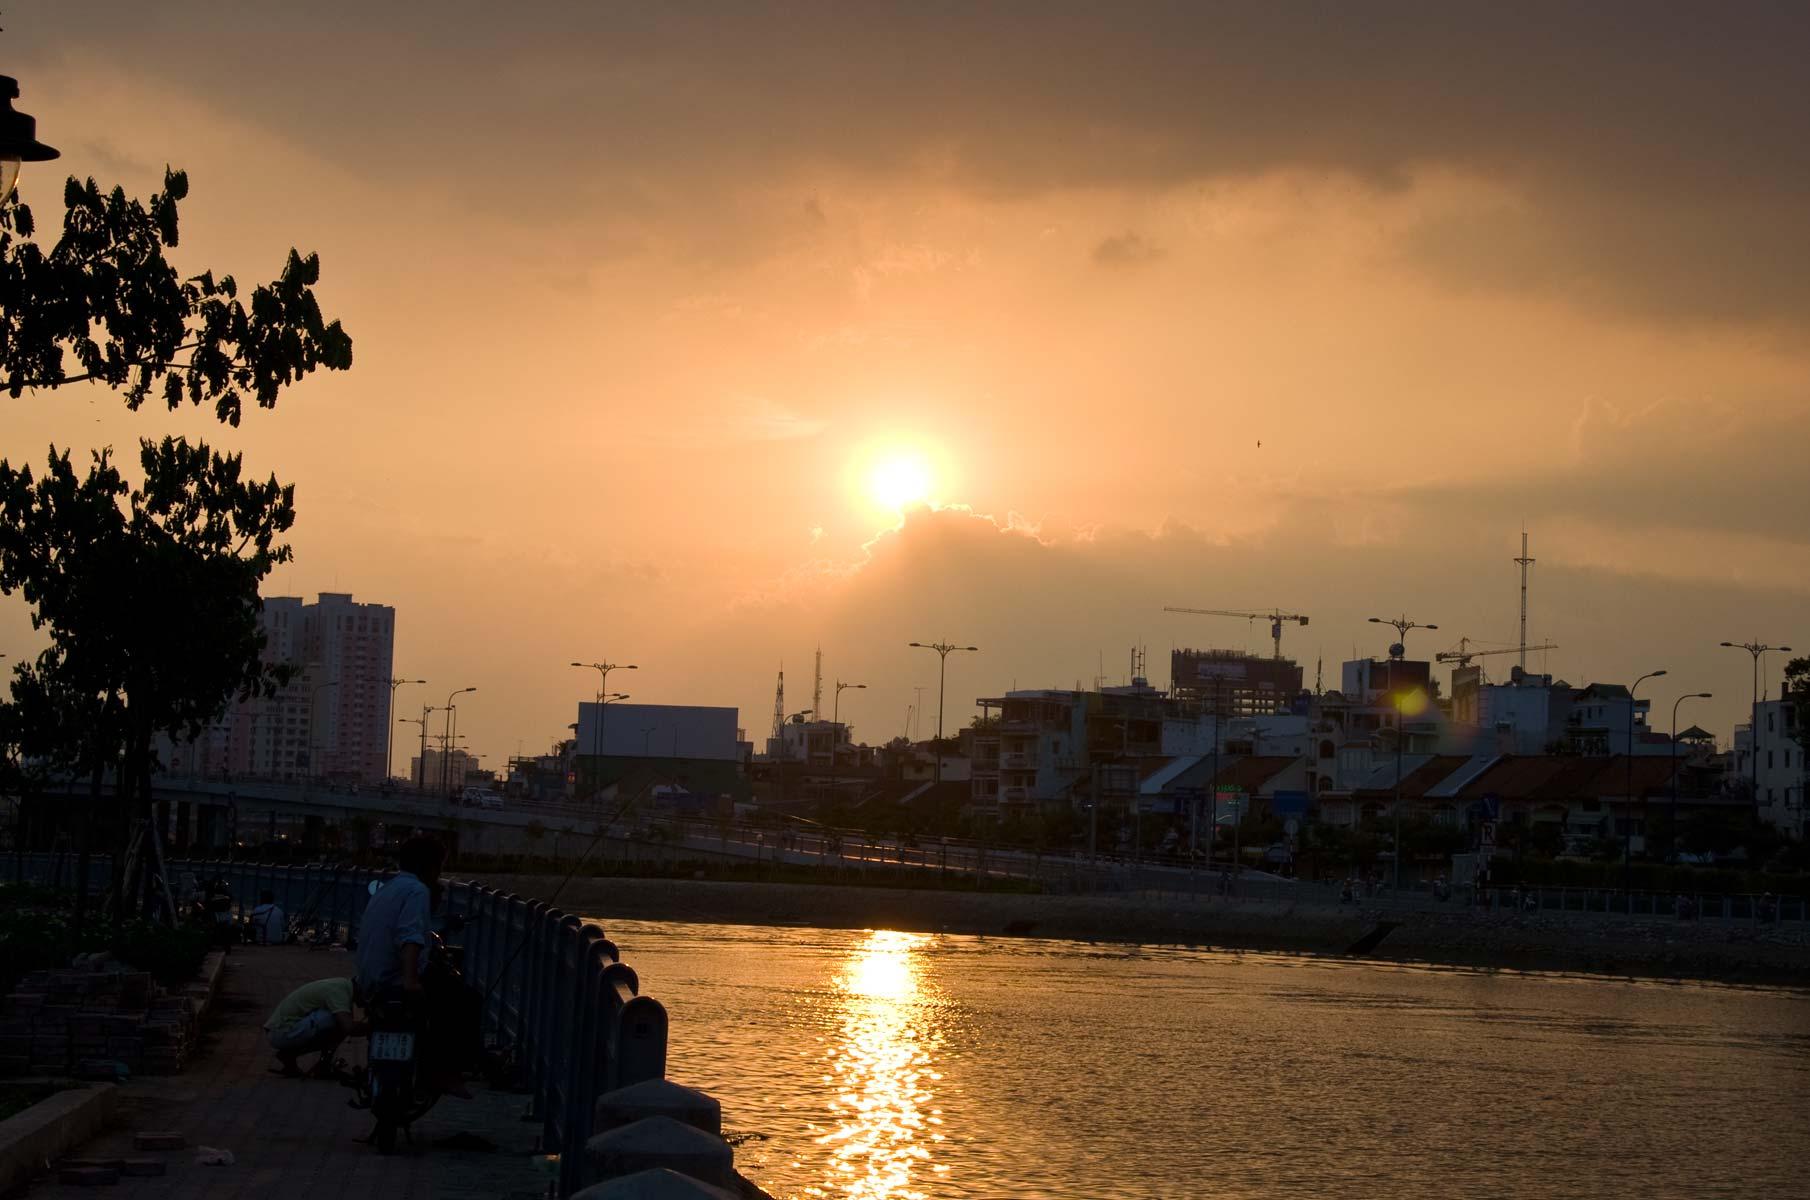 Sonnenuntergang in Saigon (Ho-Chi-Minh Stadt), Vietnam